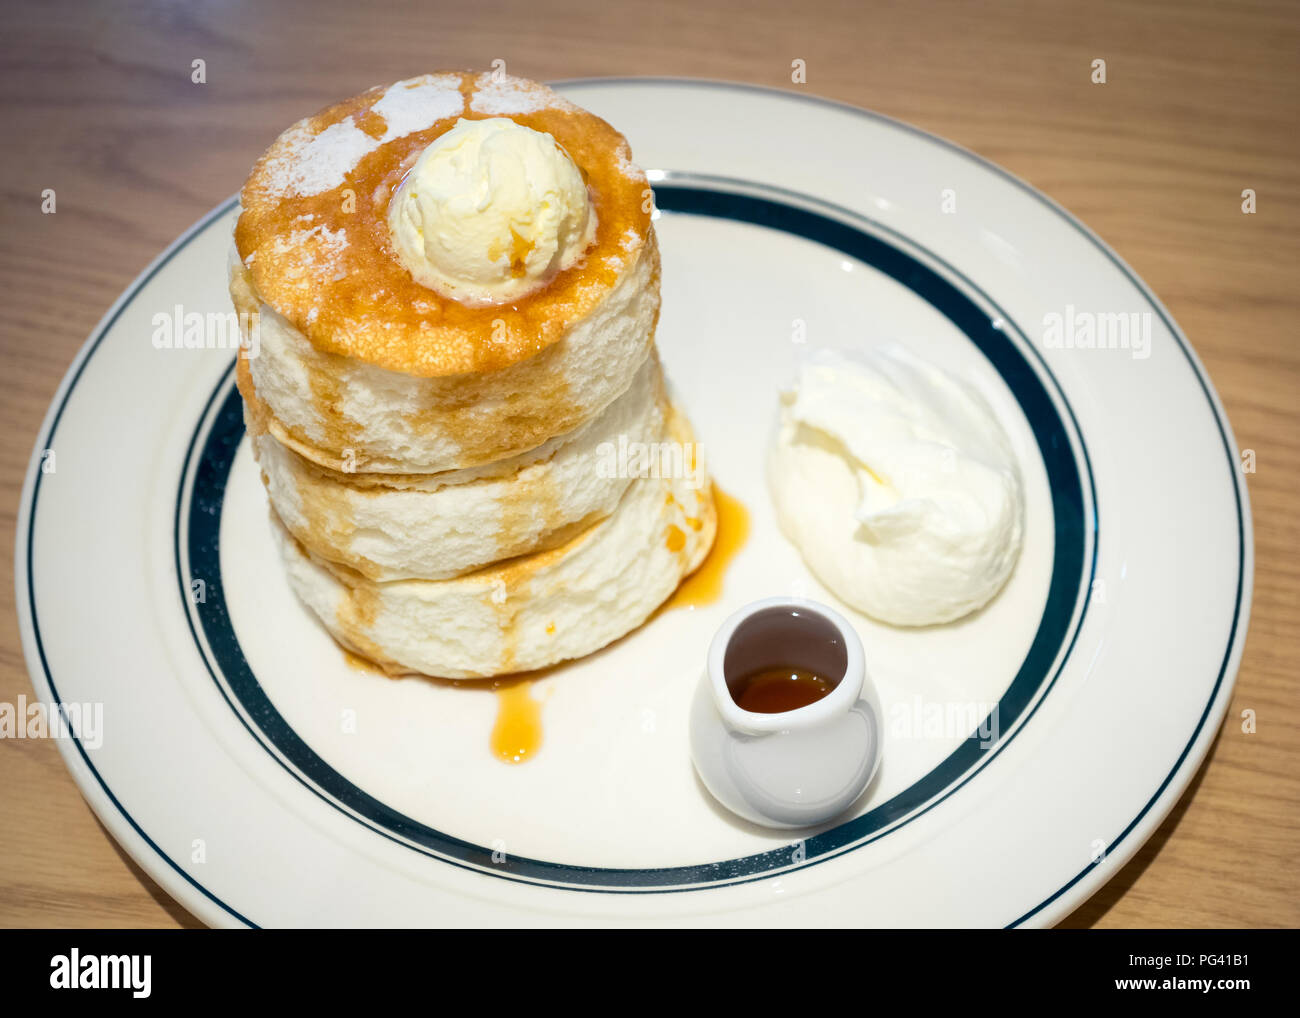 Premium Japanese soufflé pancakes from Café Gram and Pancakes in HIroshima, Japan. - Stock Image